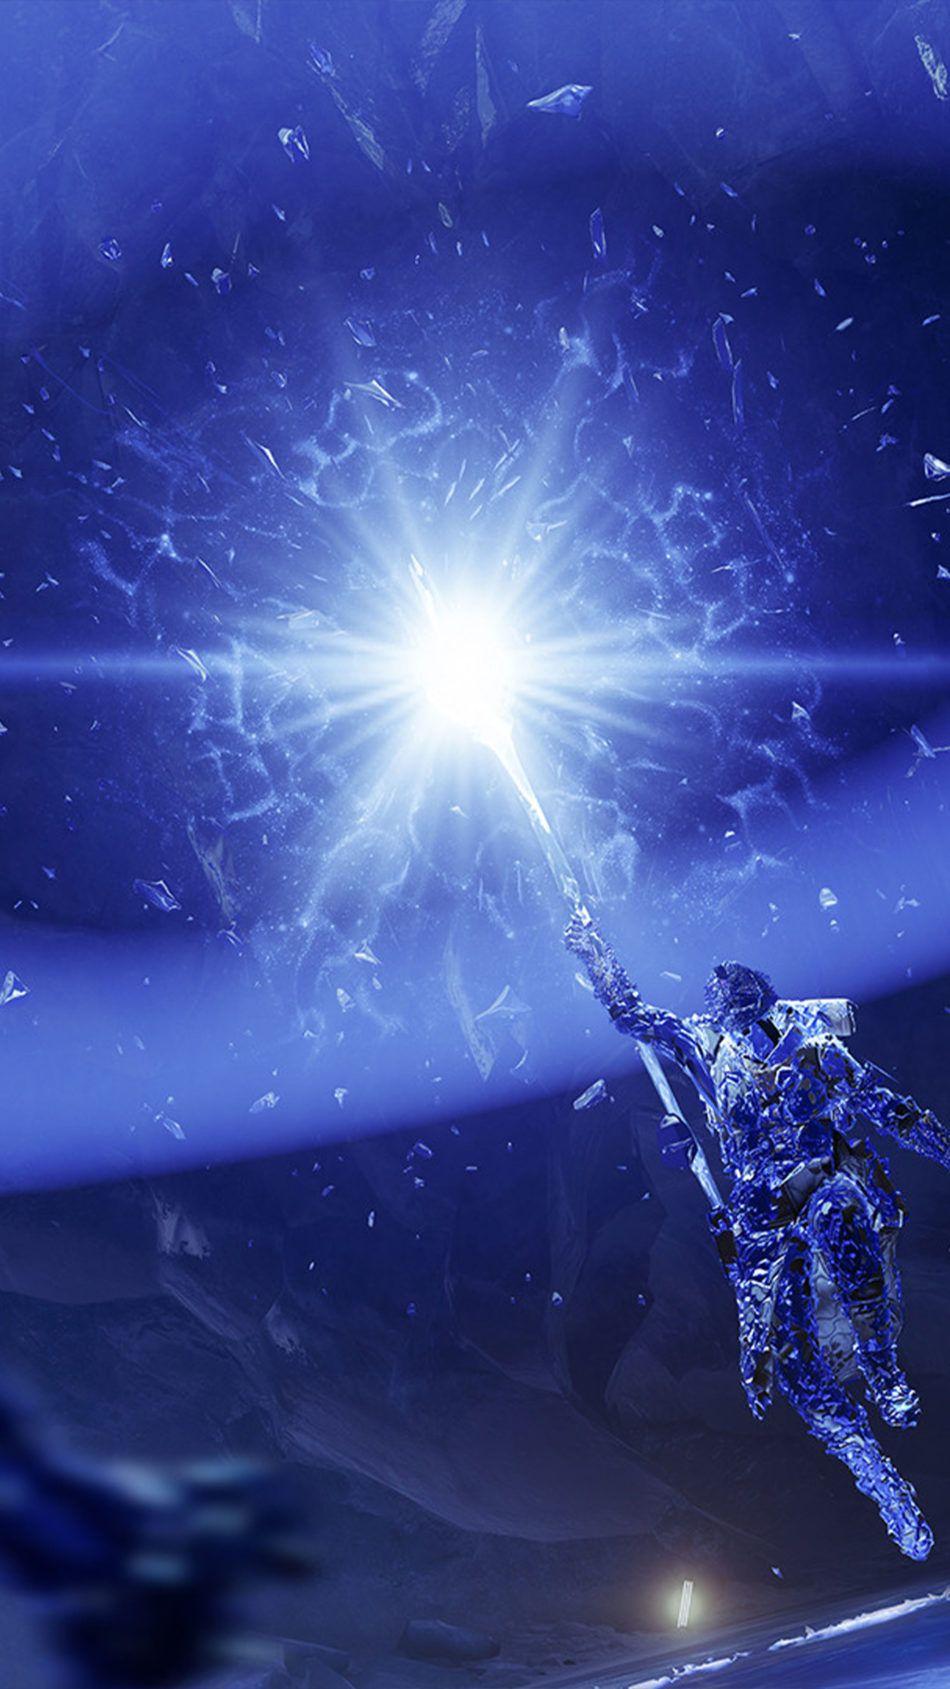 Destiny 2 Beyond Light Poster 4k Ultra Hd Mobile Wallpaper Destiny 2 Beyond Light Destiny Destiny 2 Beyond Light Wallpaper